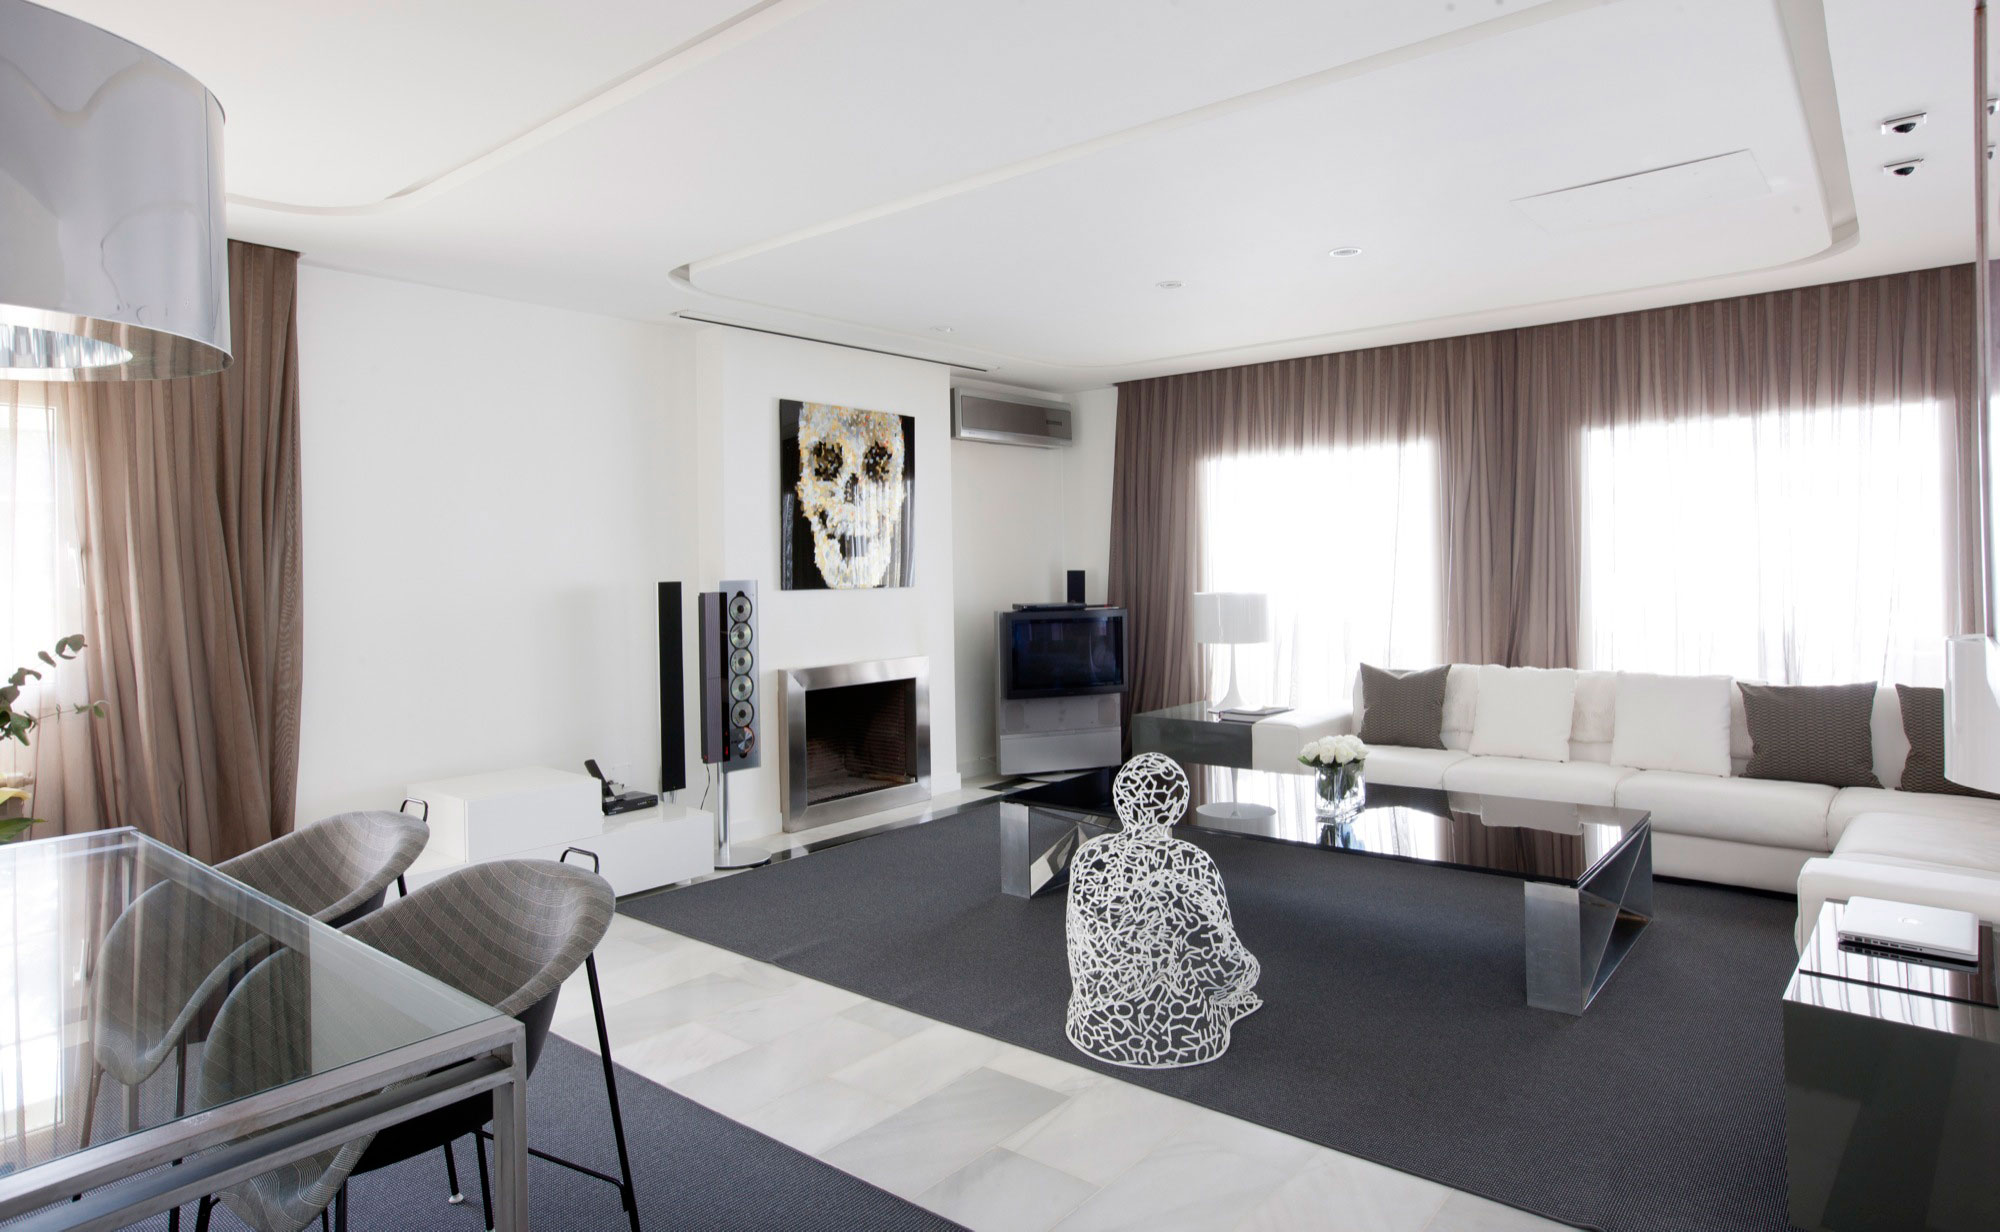 Cheap apartment living: living room apartments kitchen interior ...